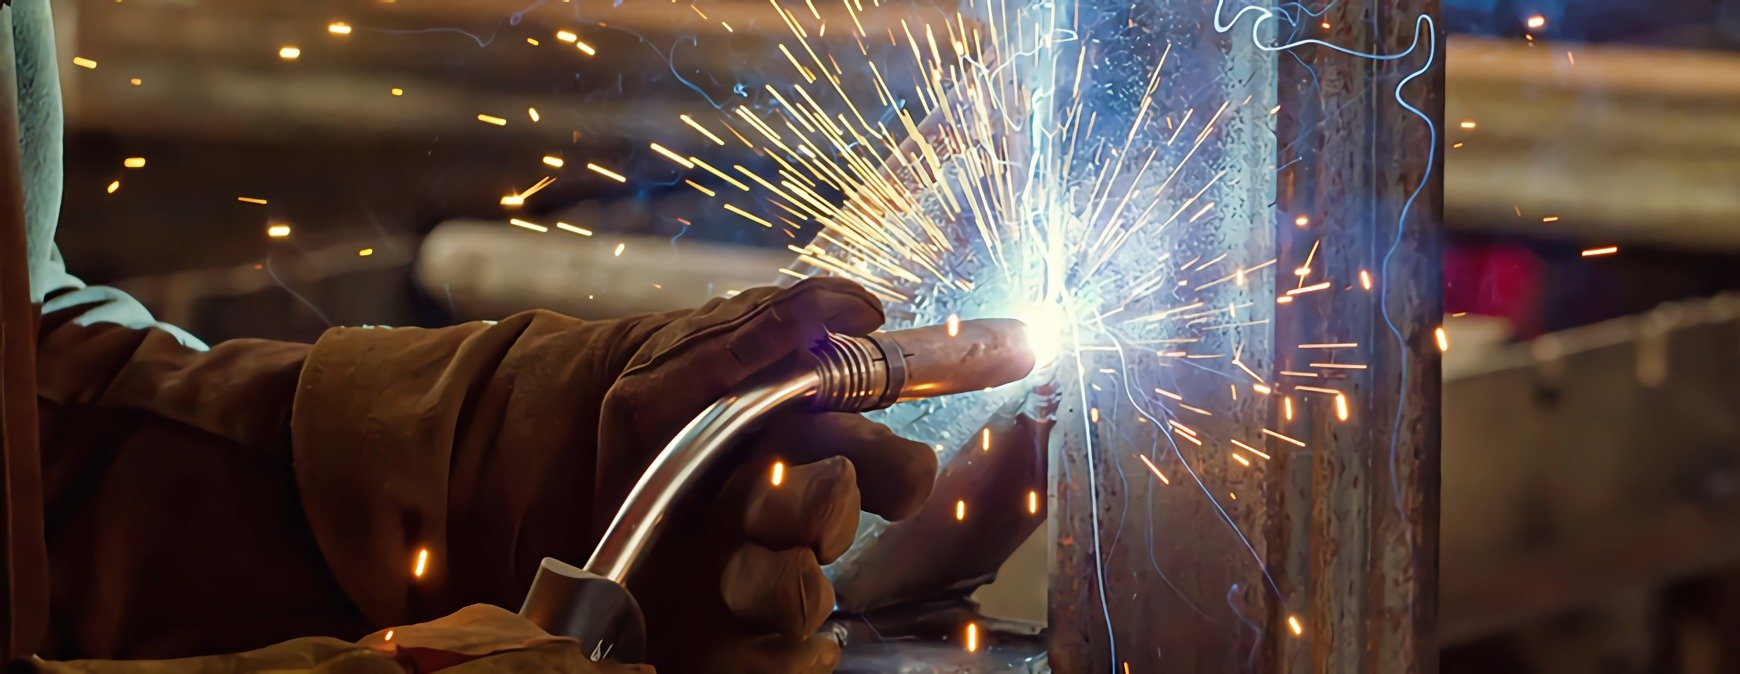 welding skilled trade